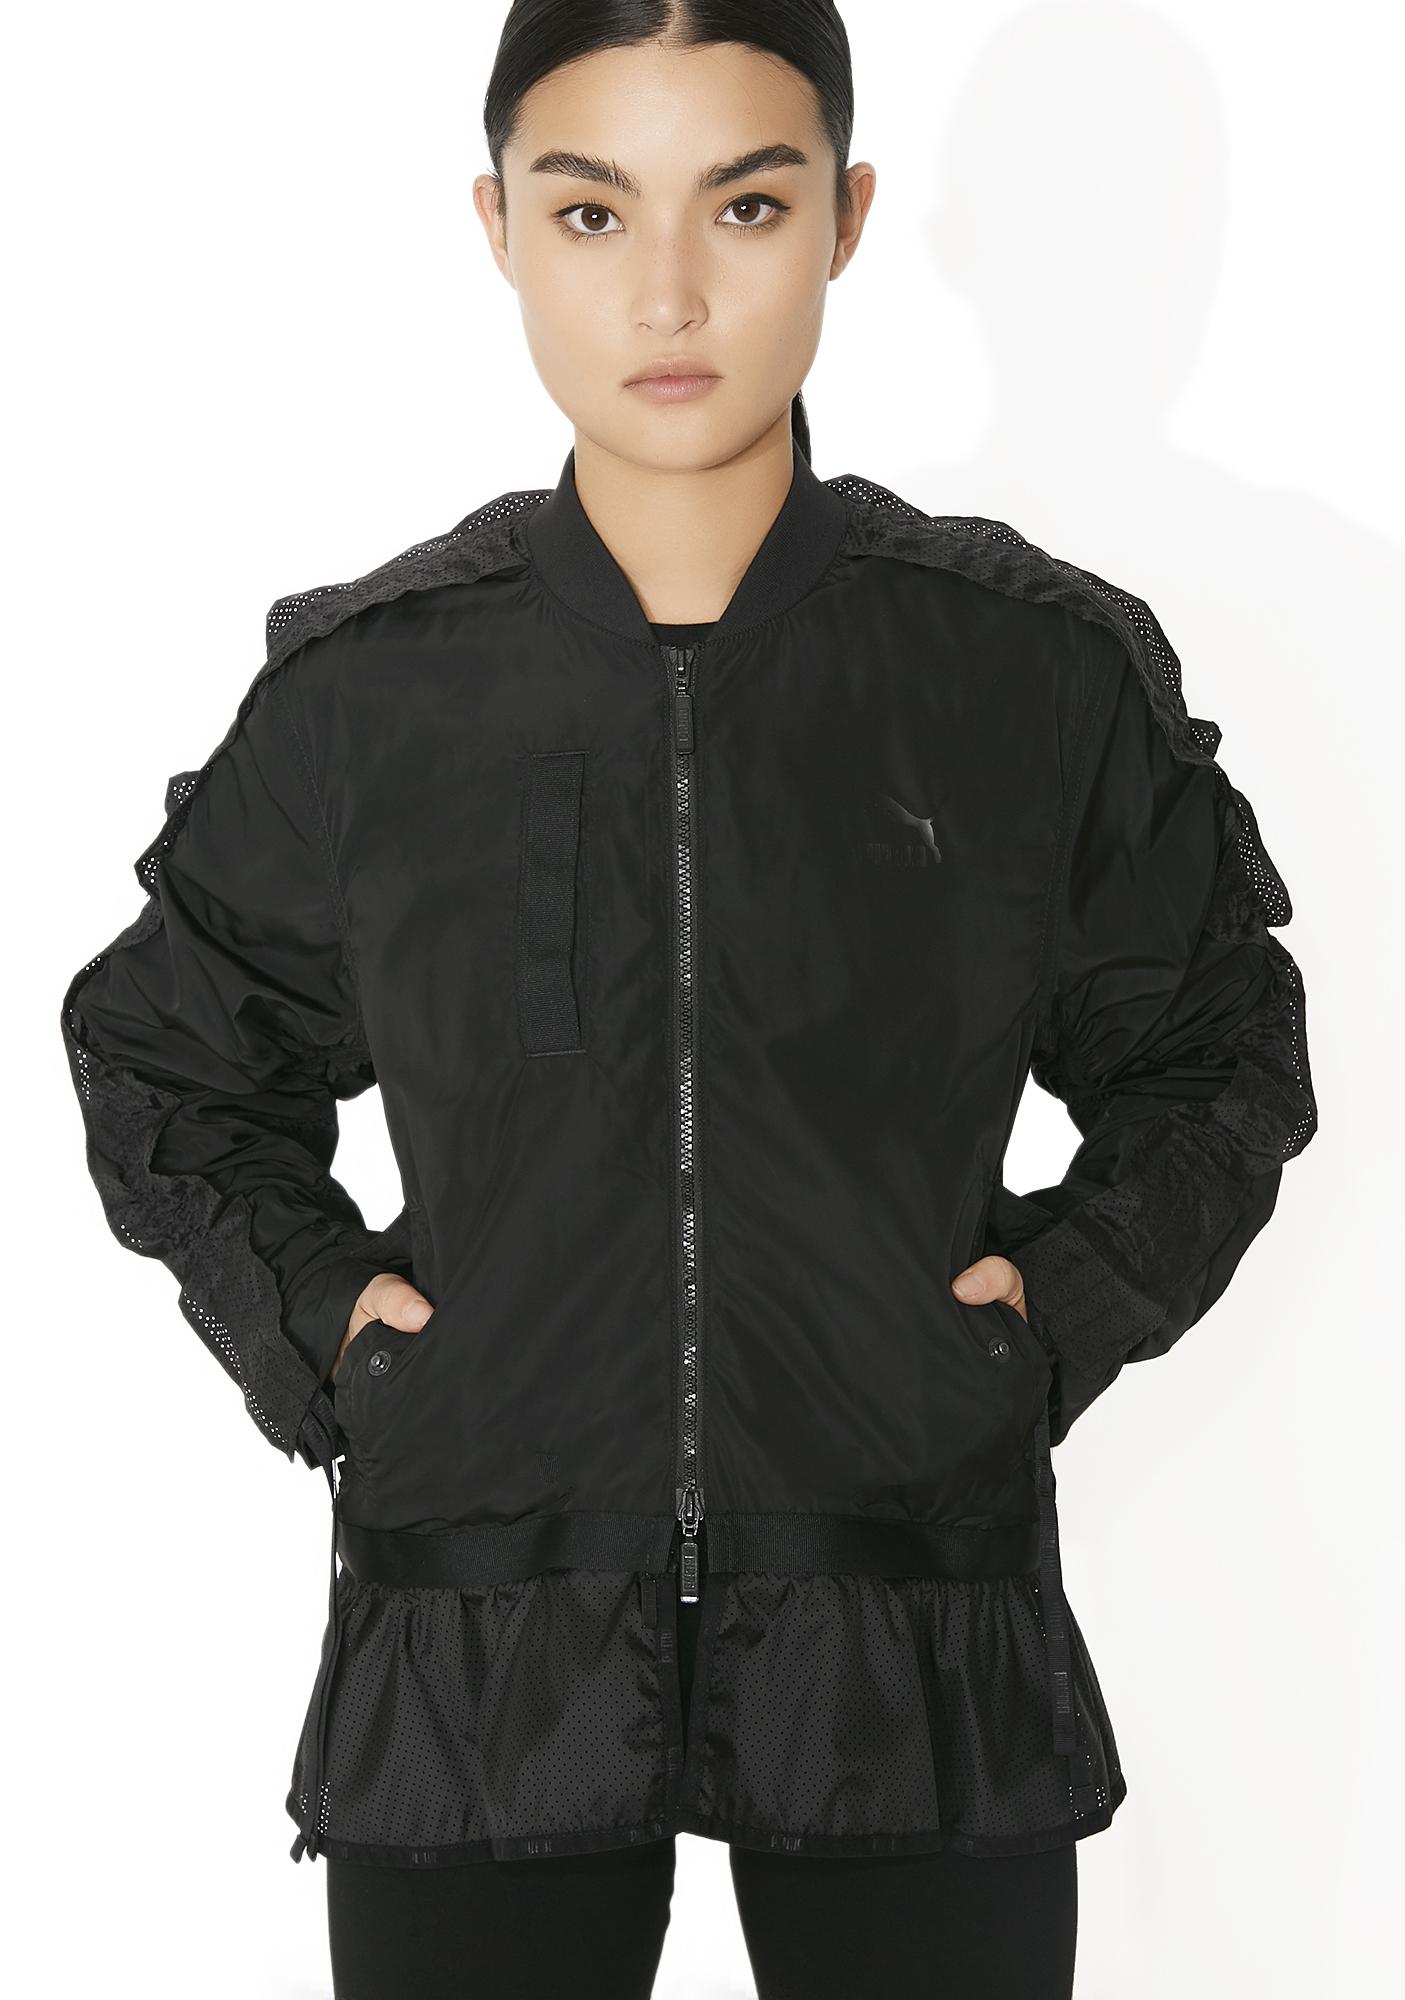 PUMA Xtreme Frill Bomber Jacket